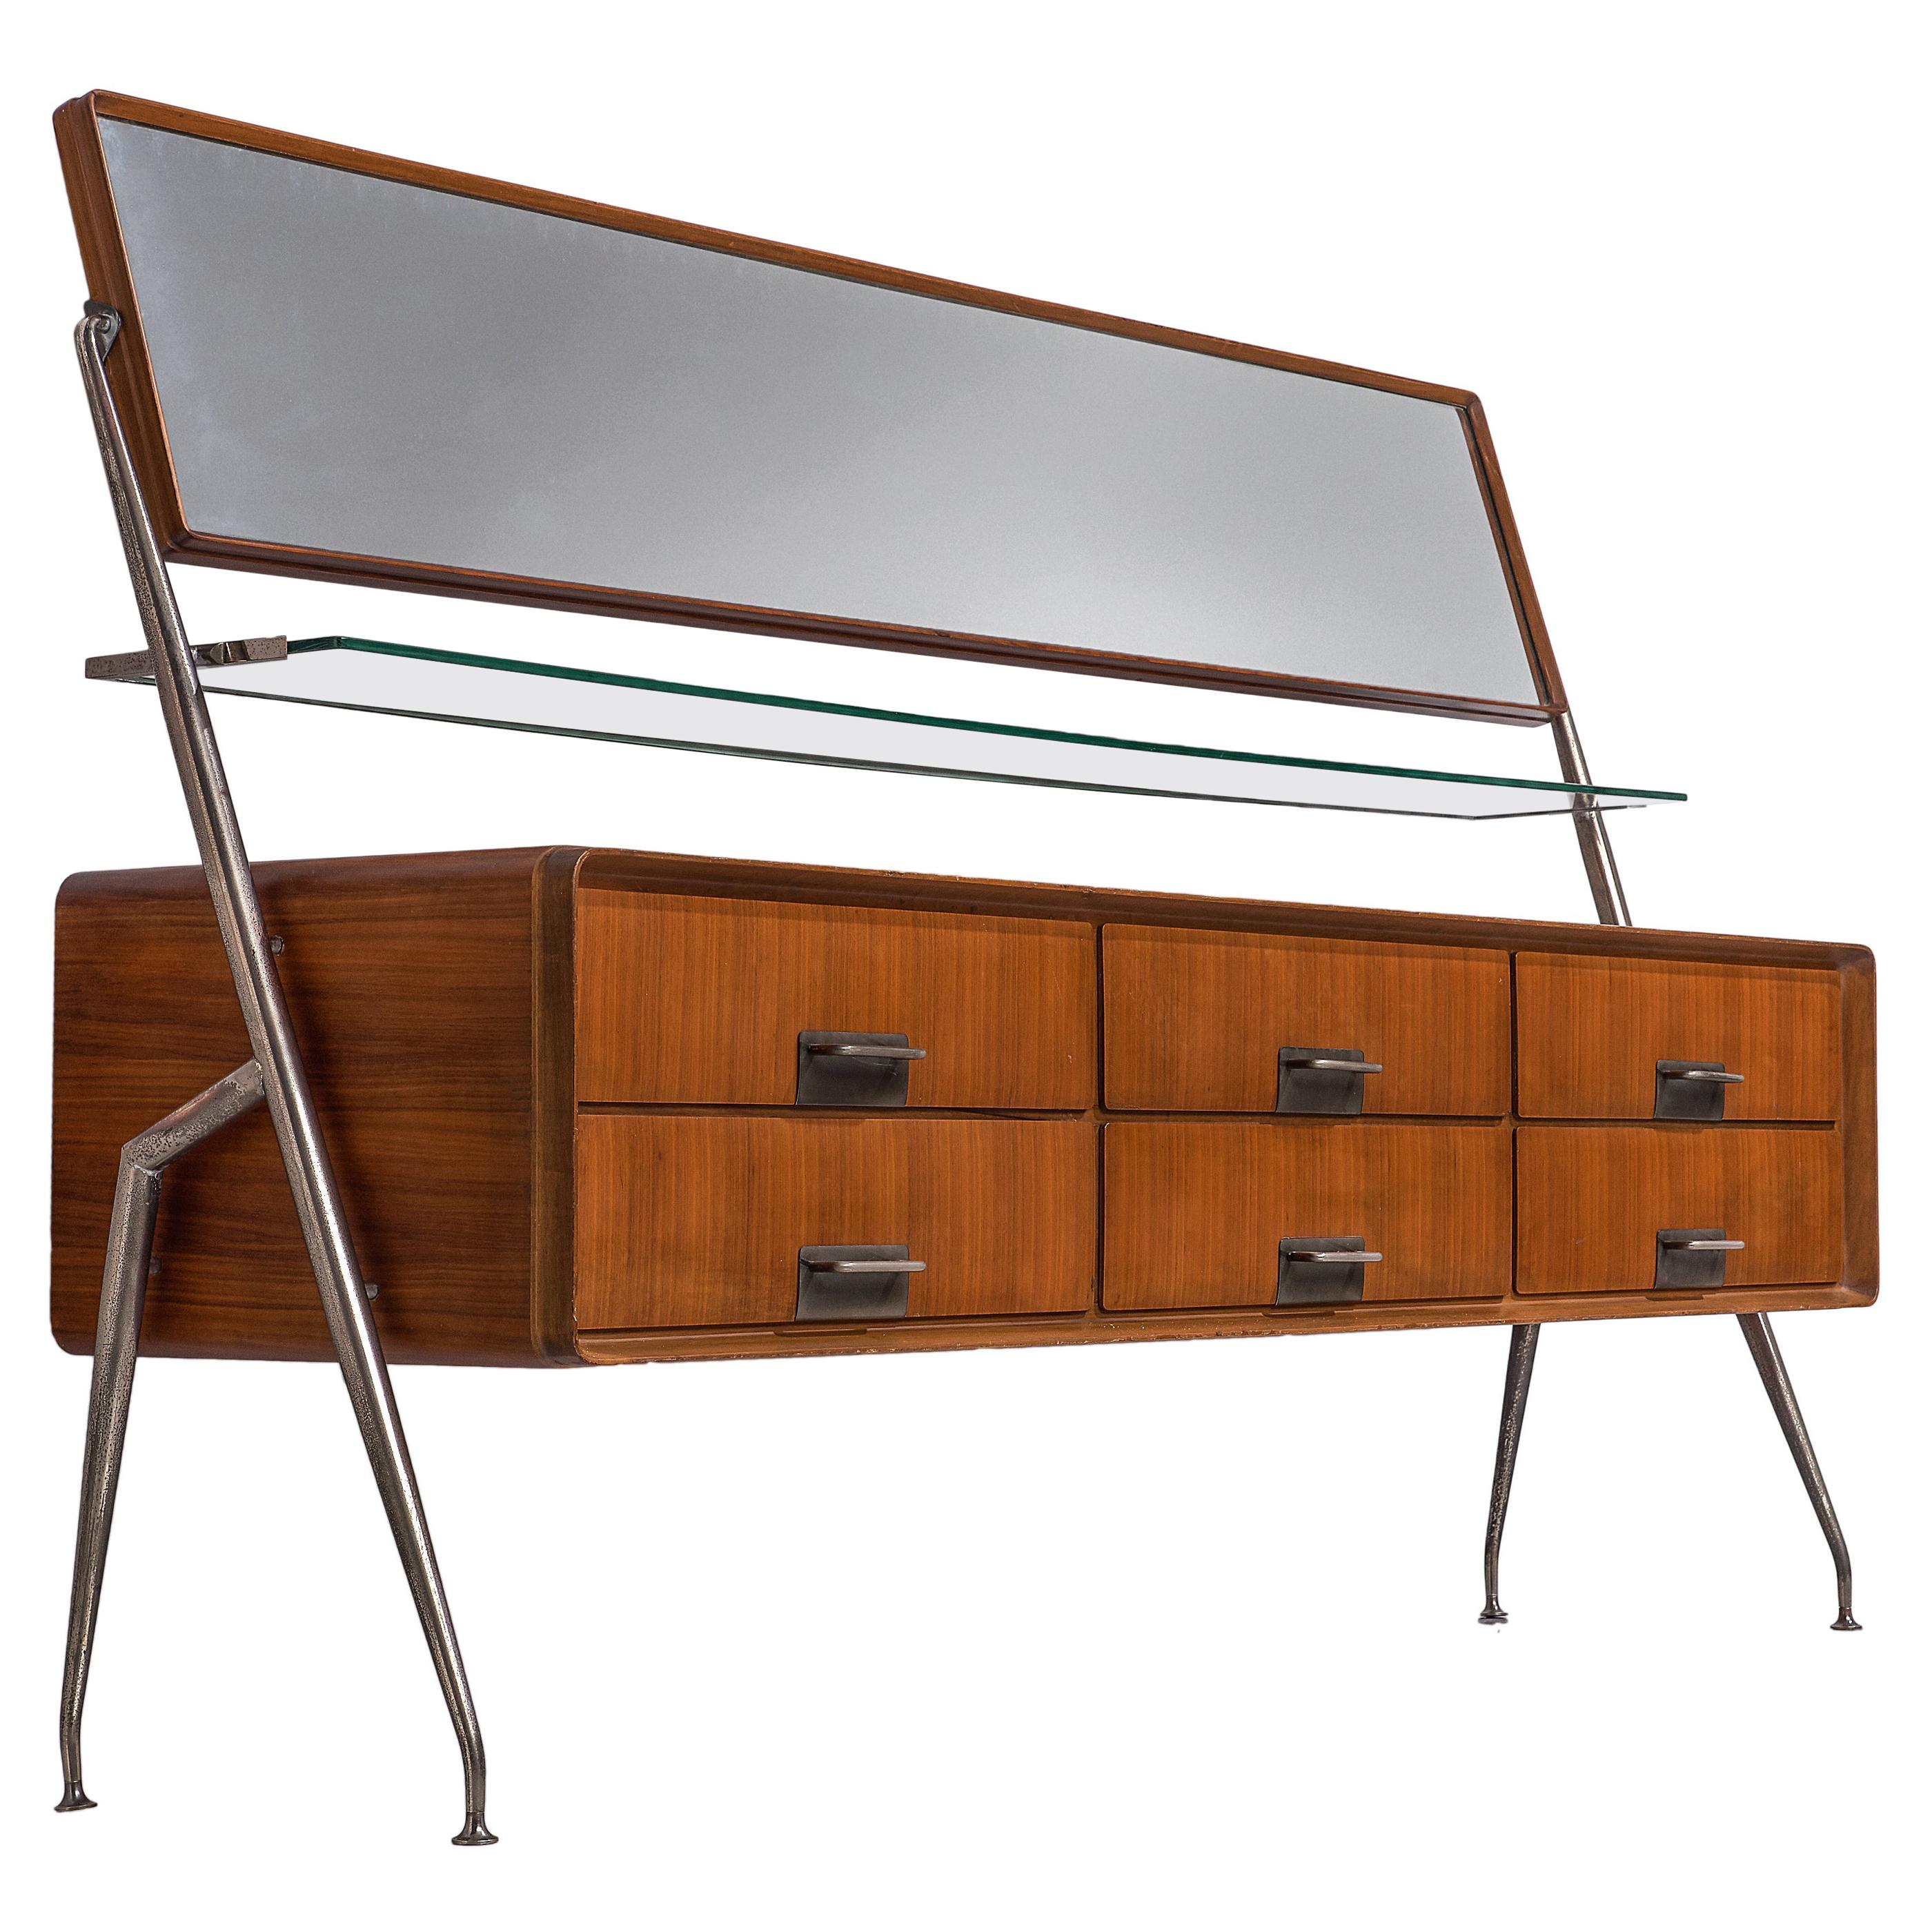 Silvio Cavatorta Sideboard with Mirror in Mahogany